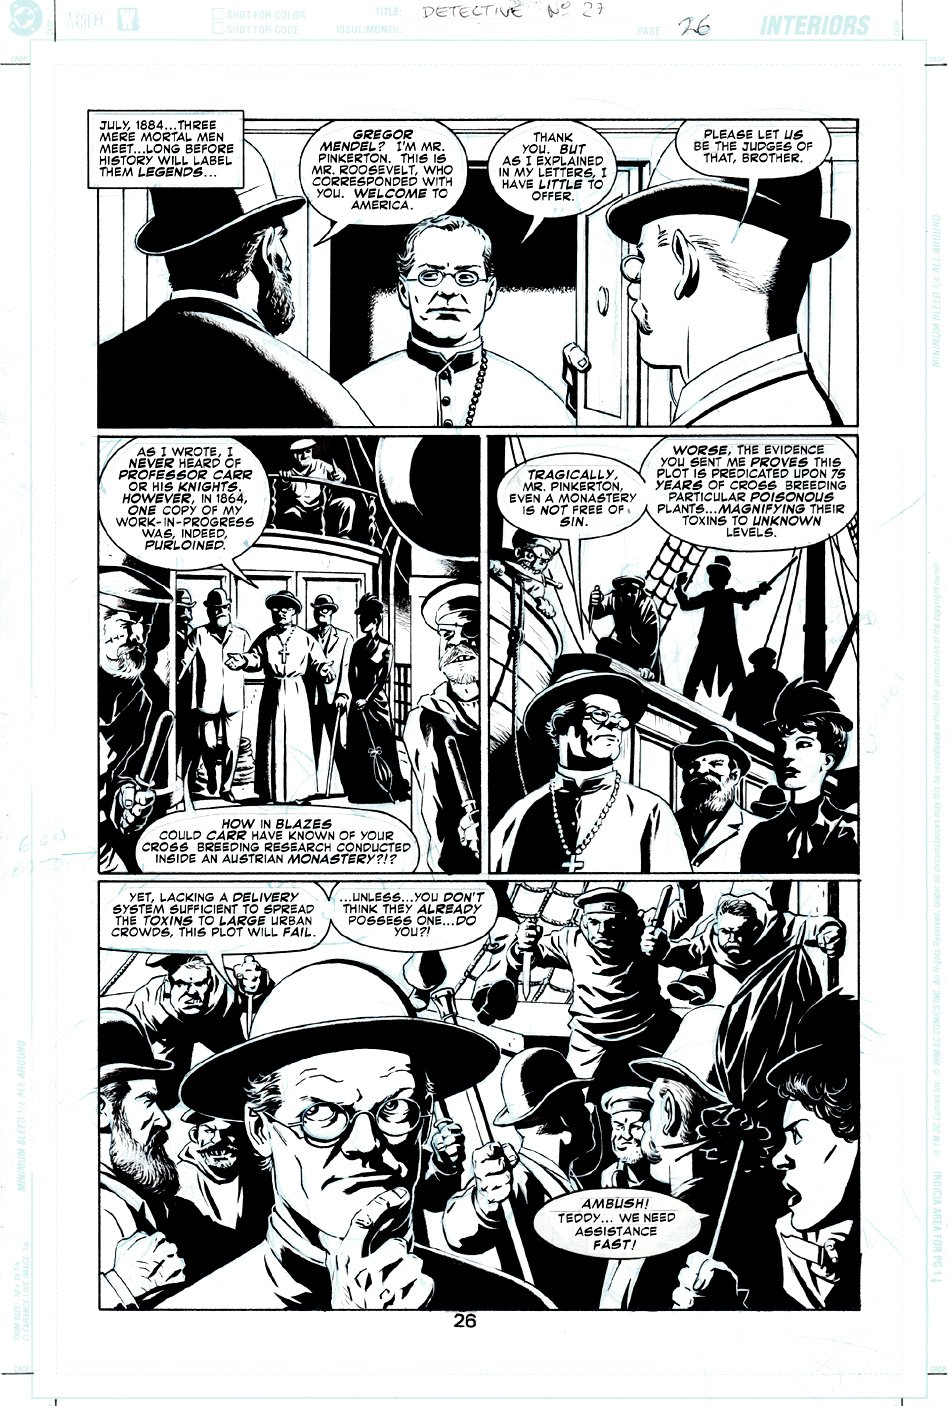 Batman: Detective #27 p 26 (Teddy Roosevelt, Mr. Pinkerton, Gregor Mendel!) 2003